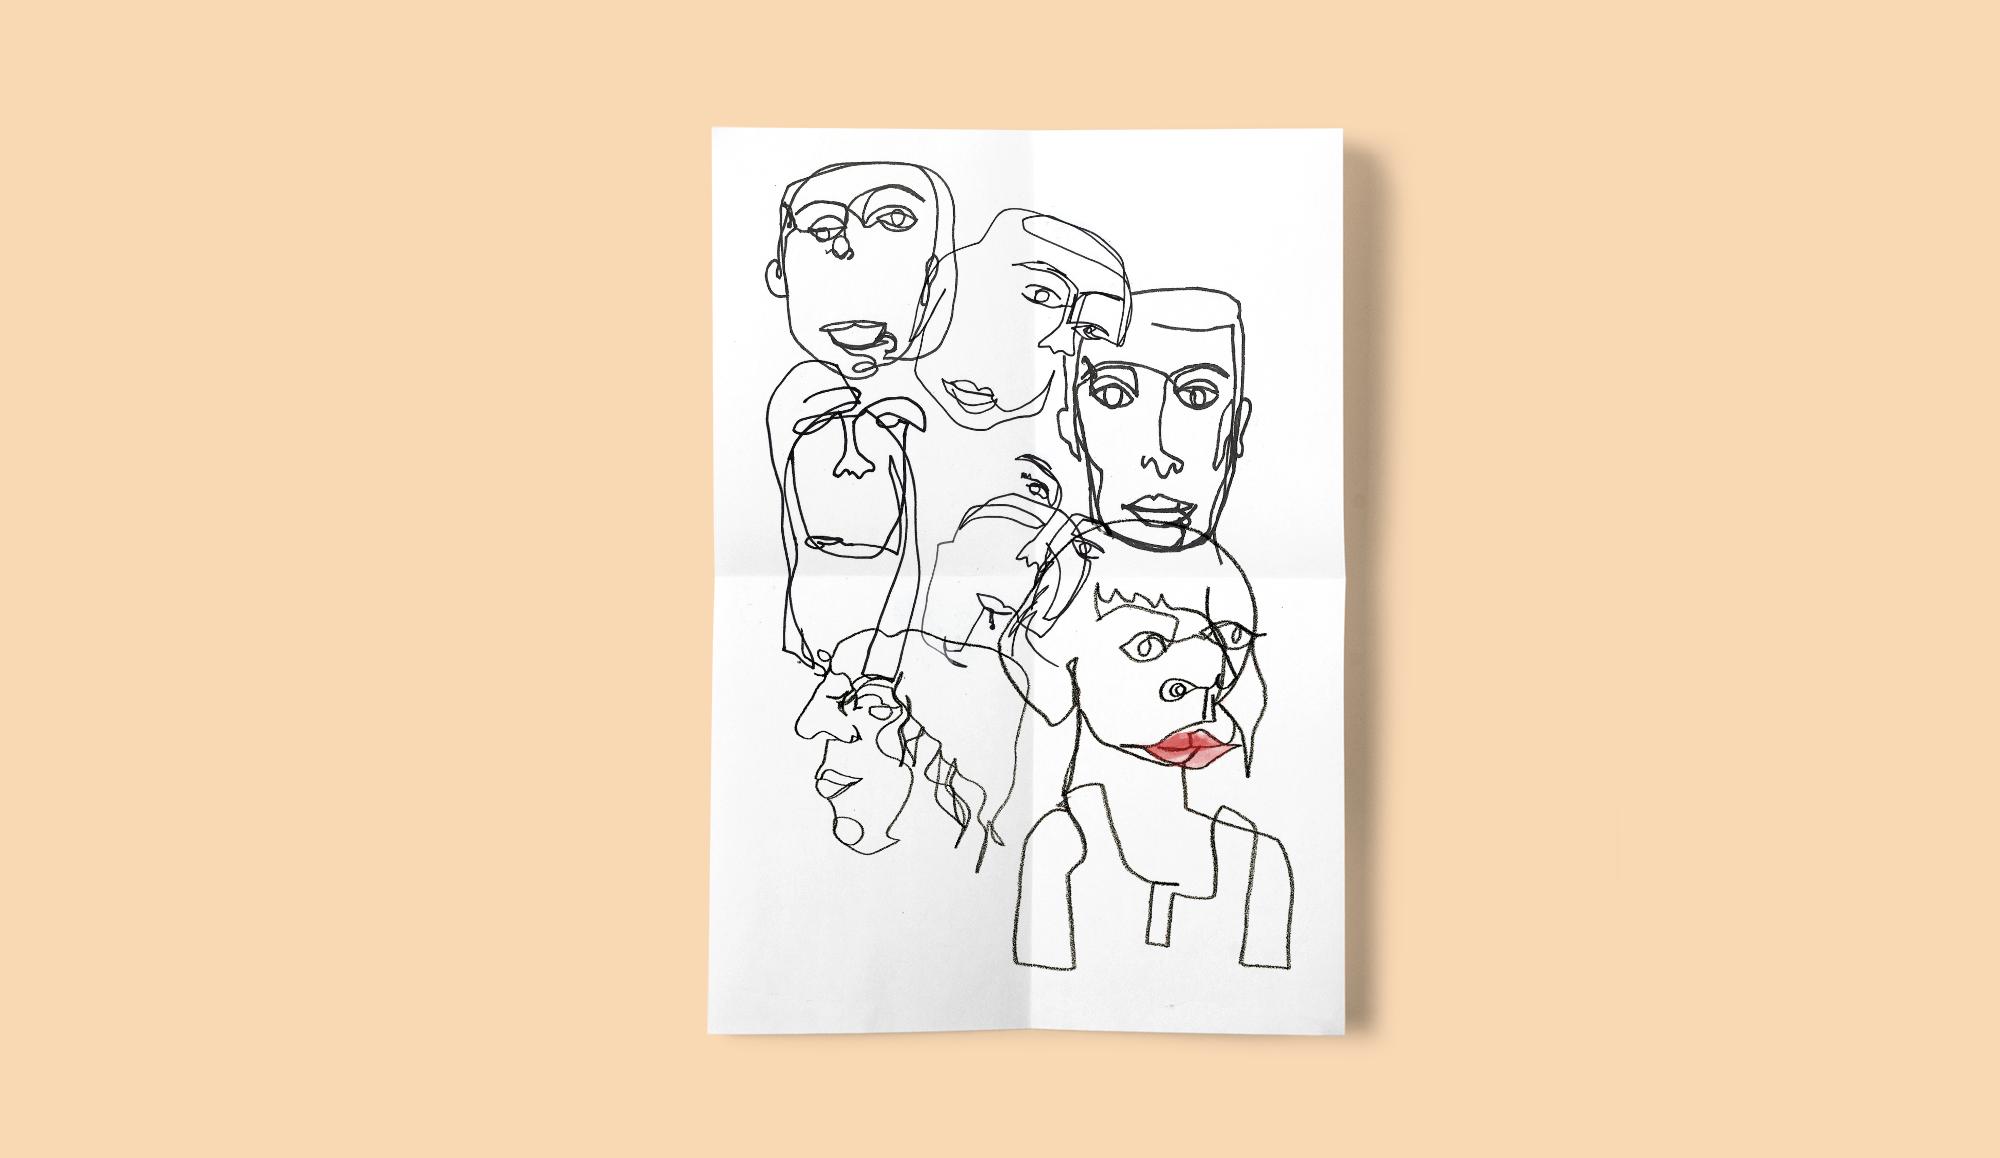 Faces-Illustration-ElmiDesign